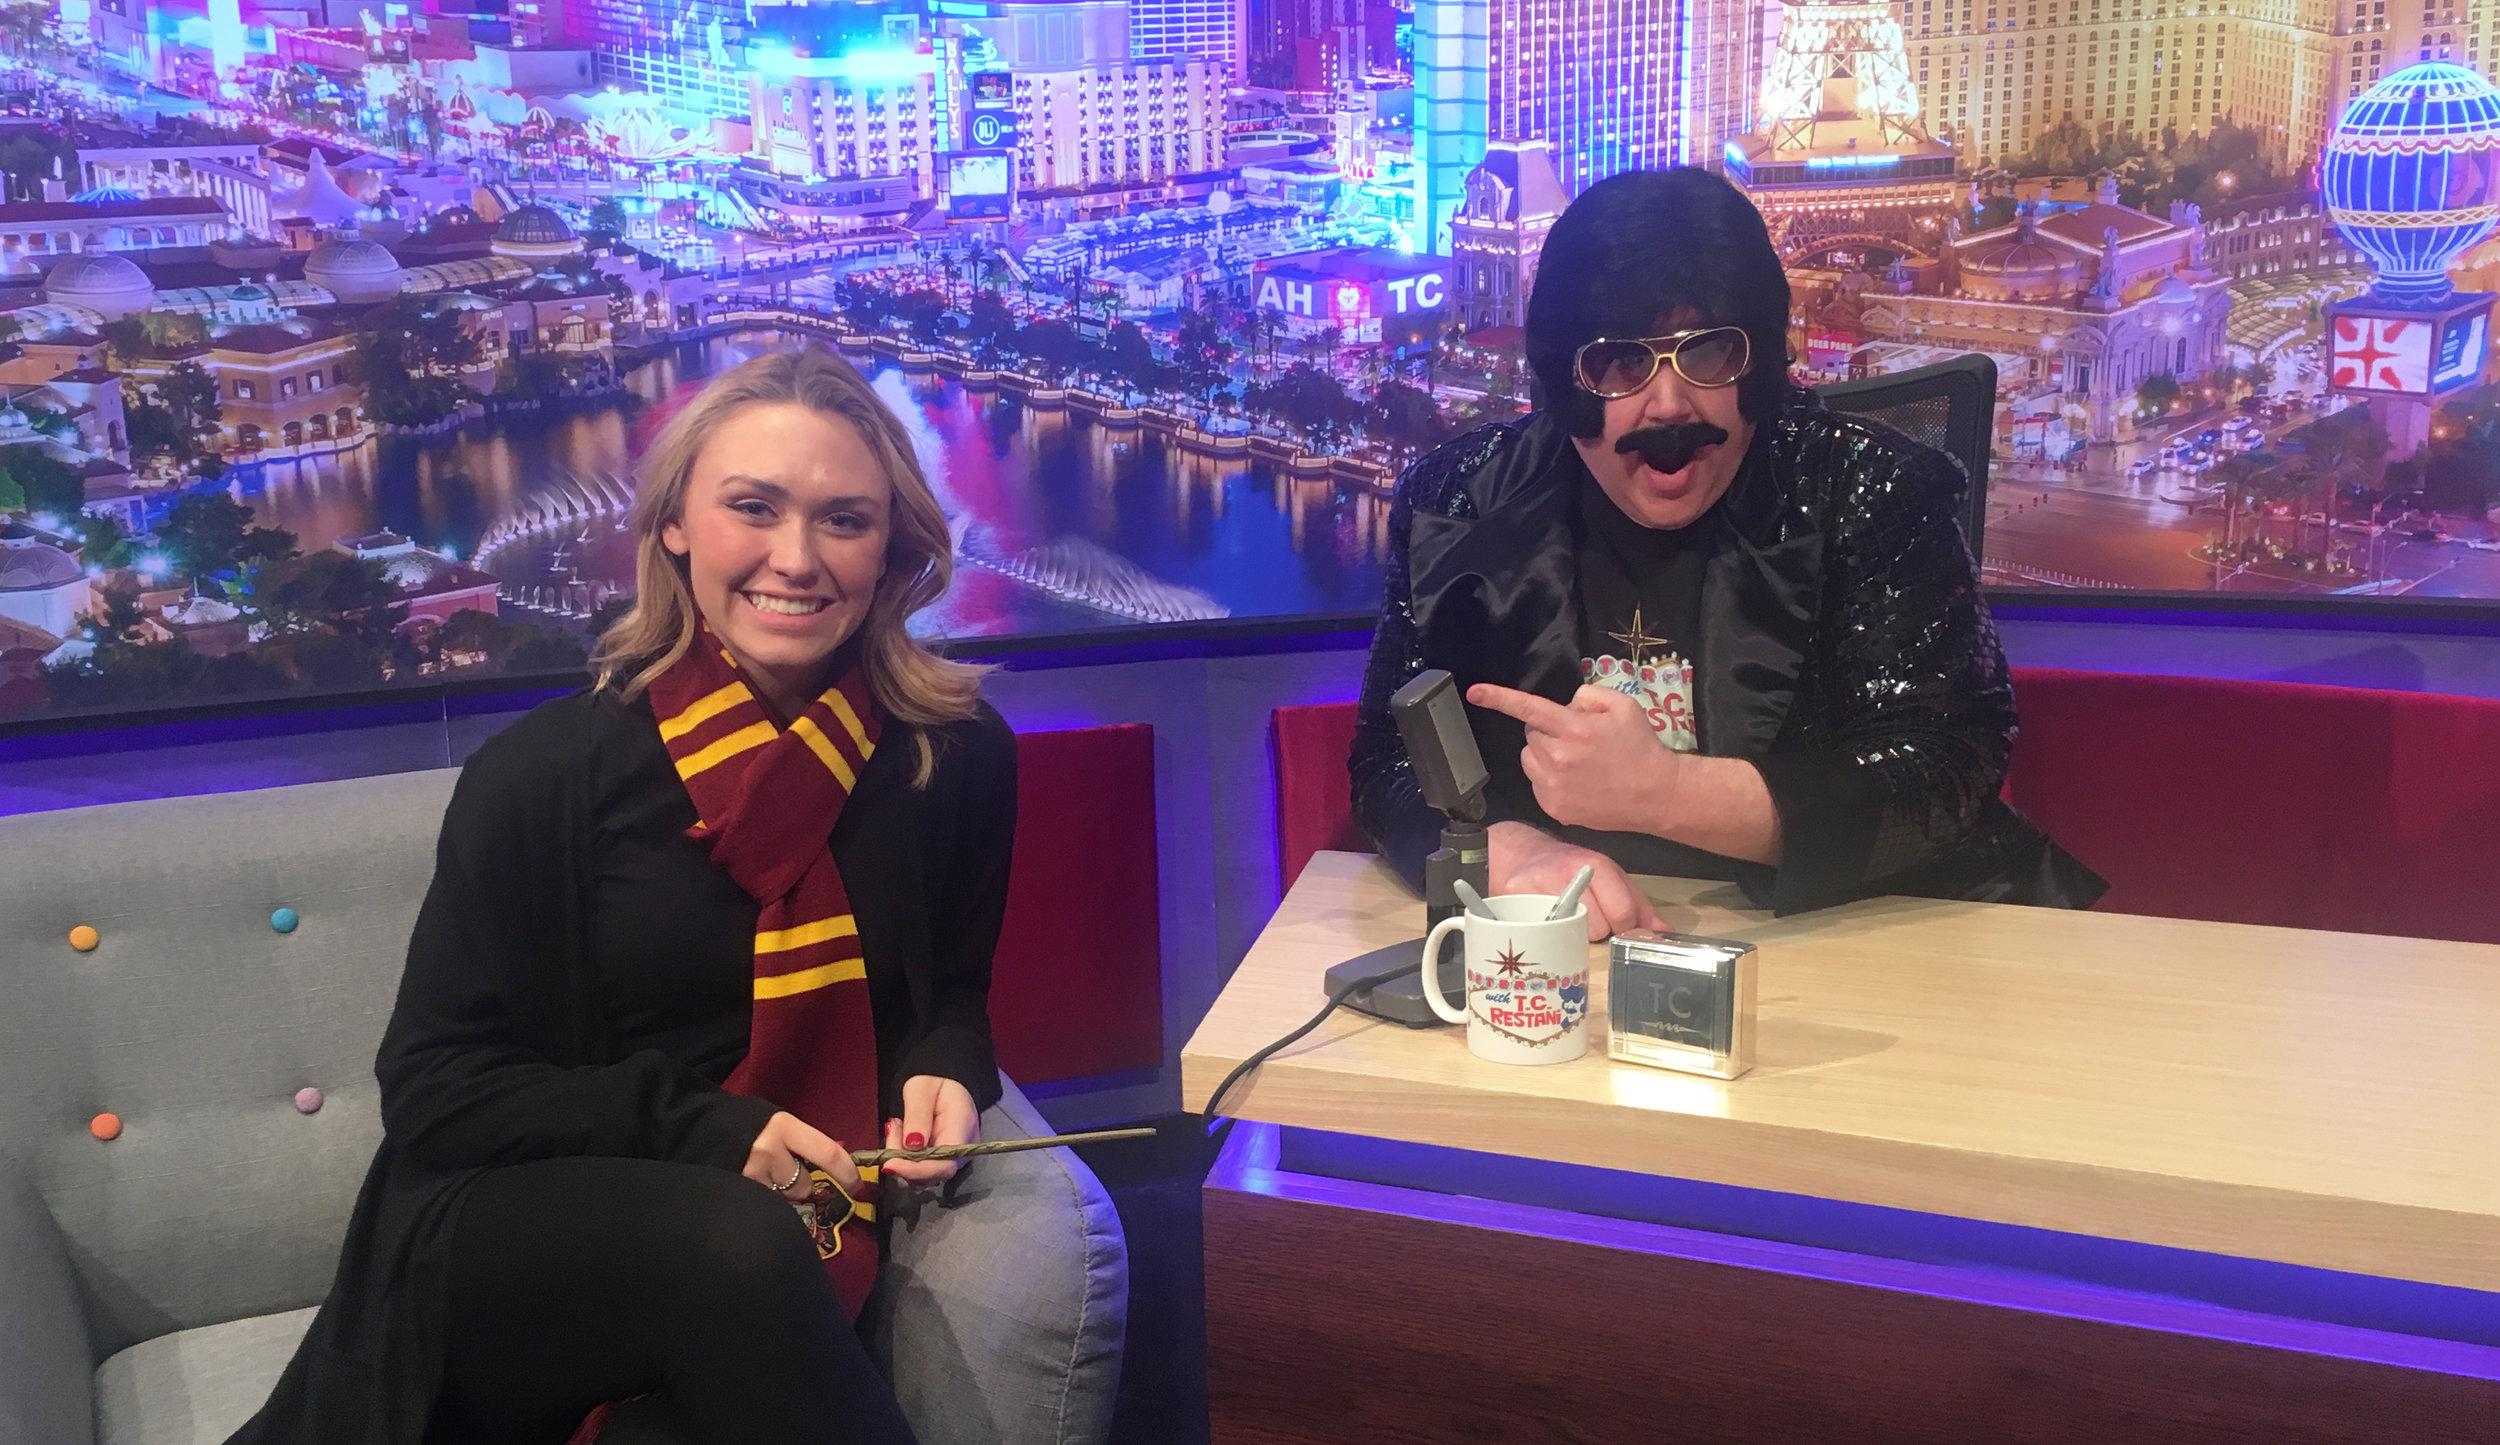 Abigail Harwich from Harry Potter